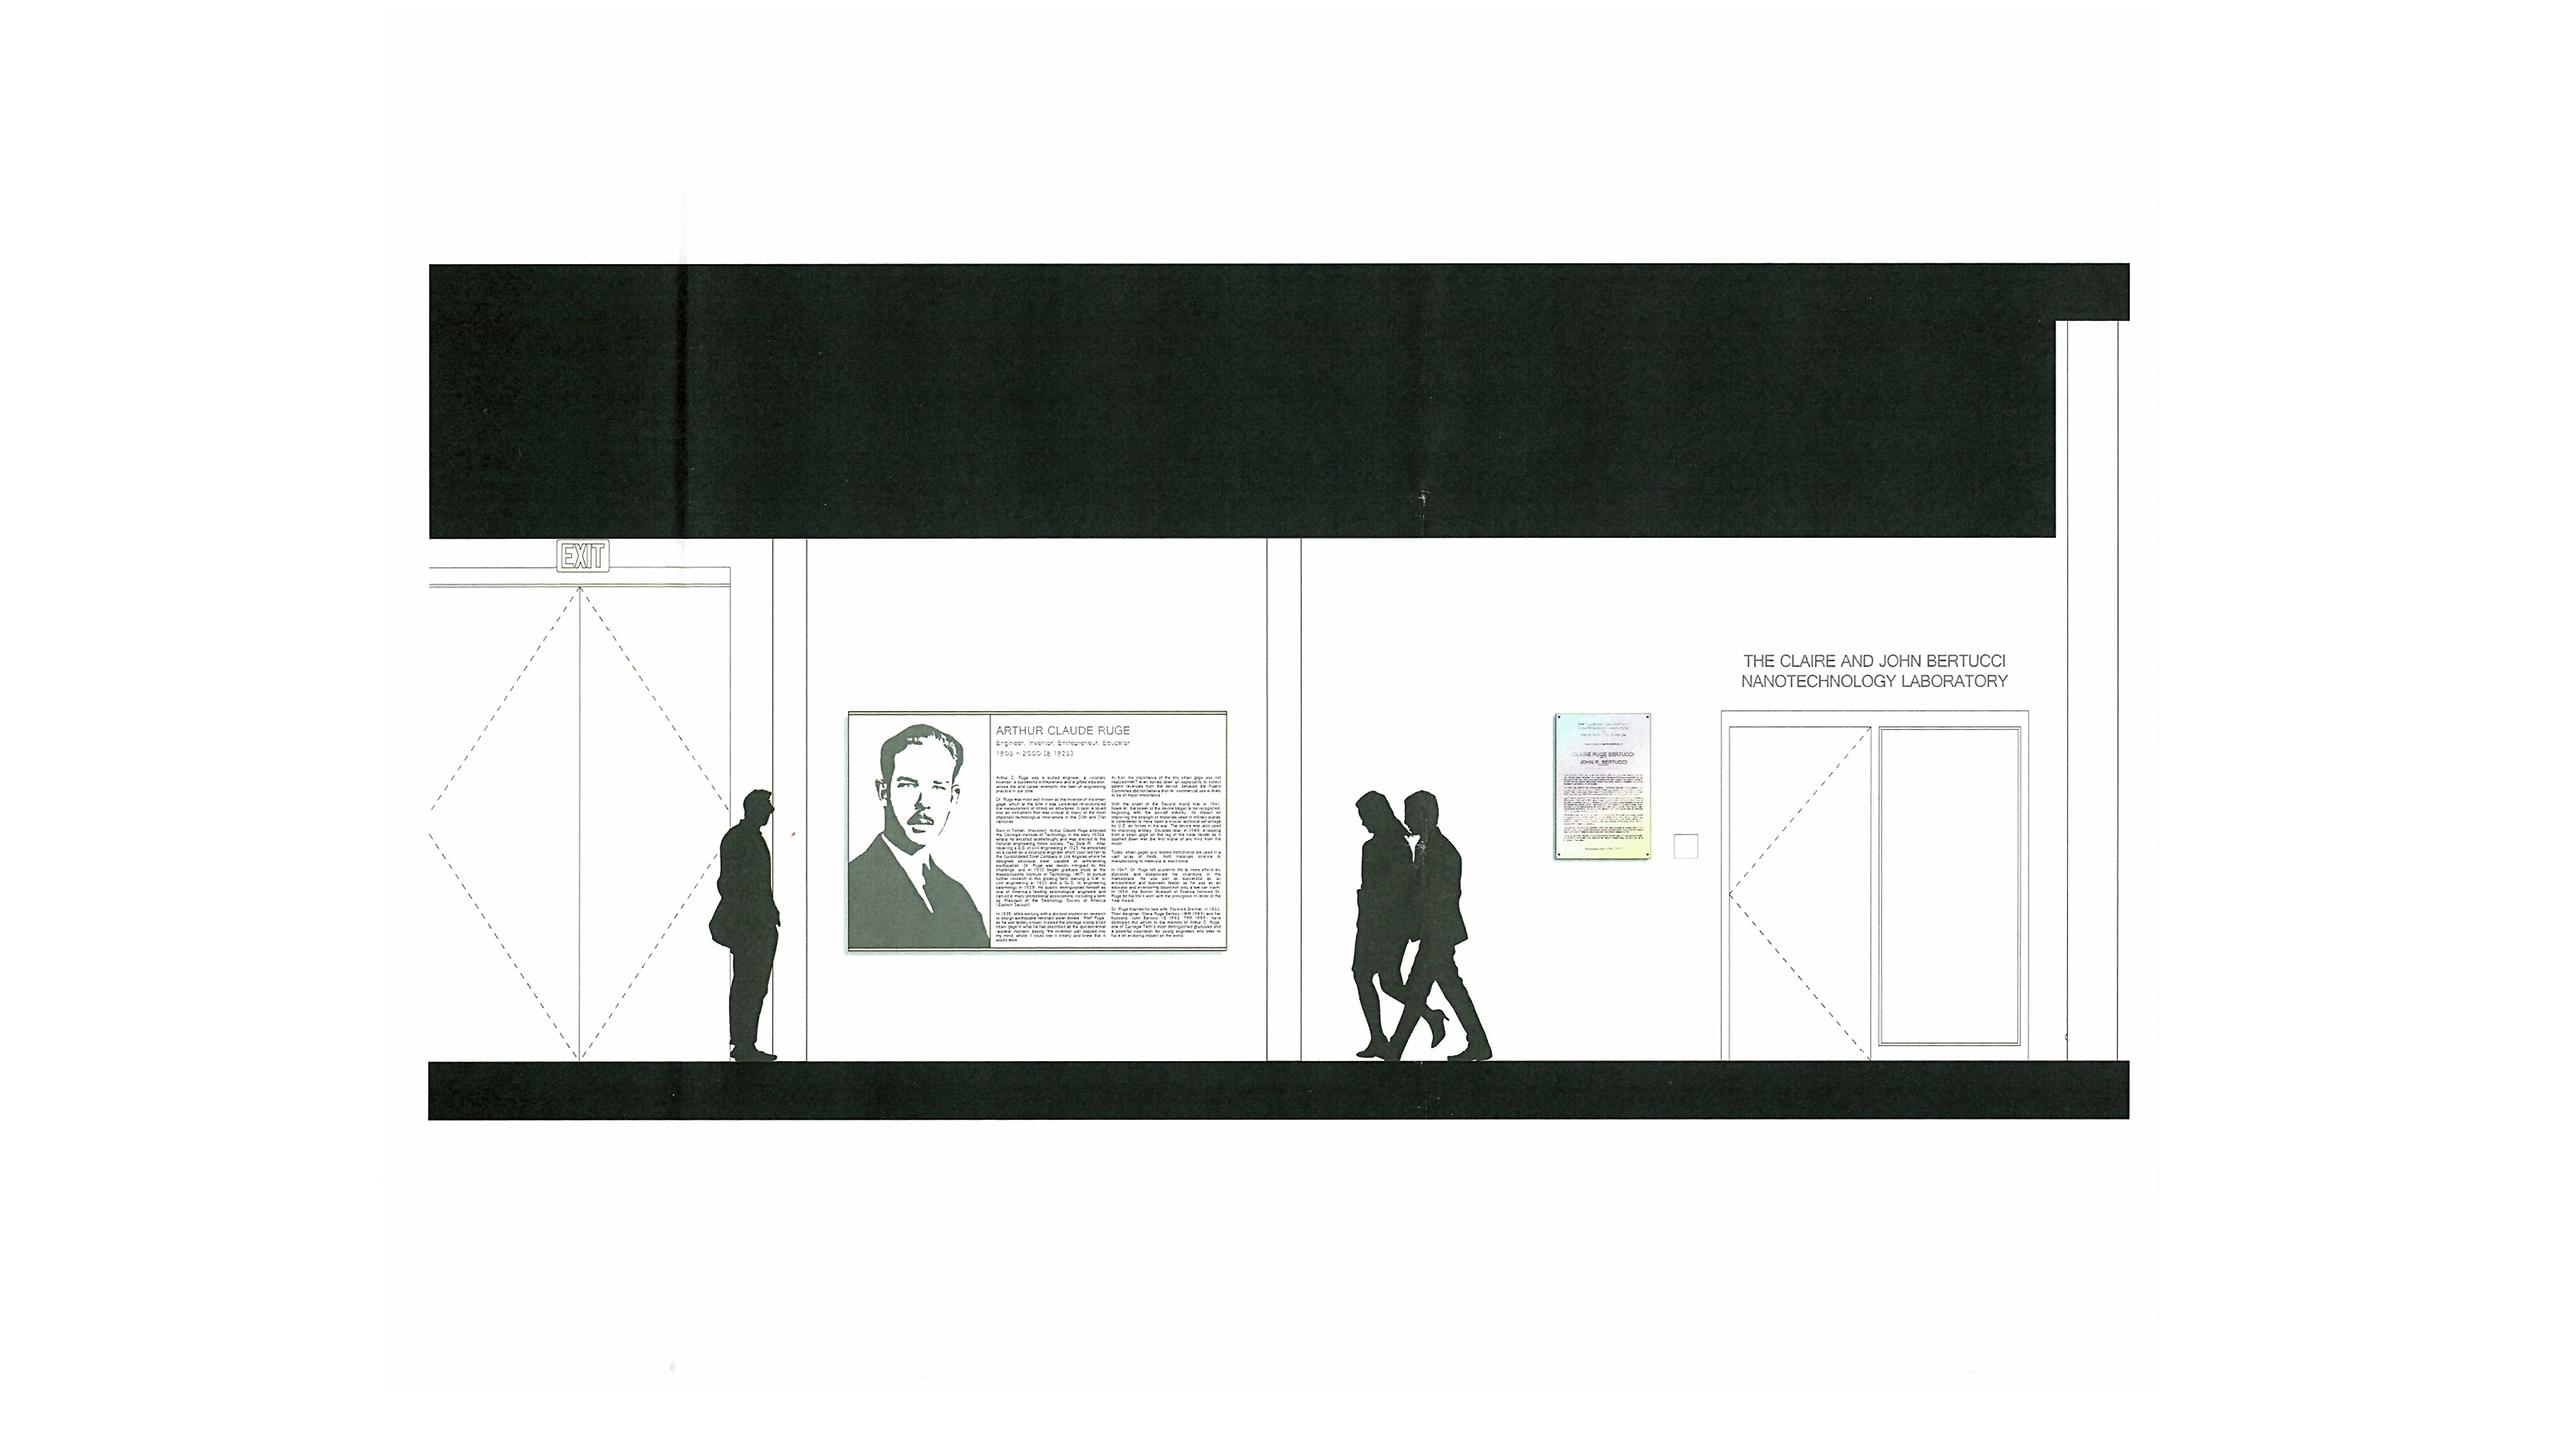 Storytelling, Artwork, Graphic and Display Design: Scott Hall at Carnegie Mellon University / image 12